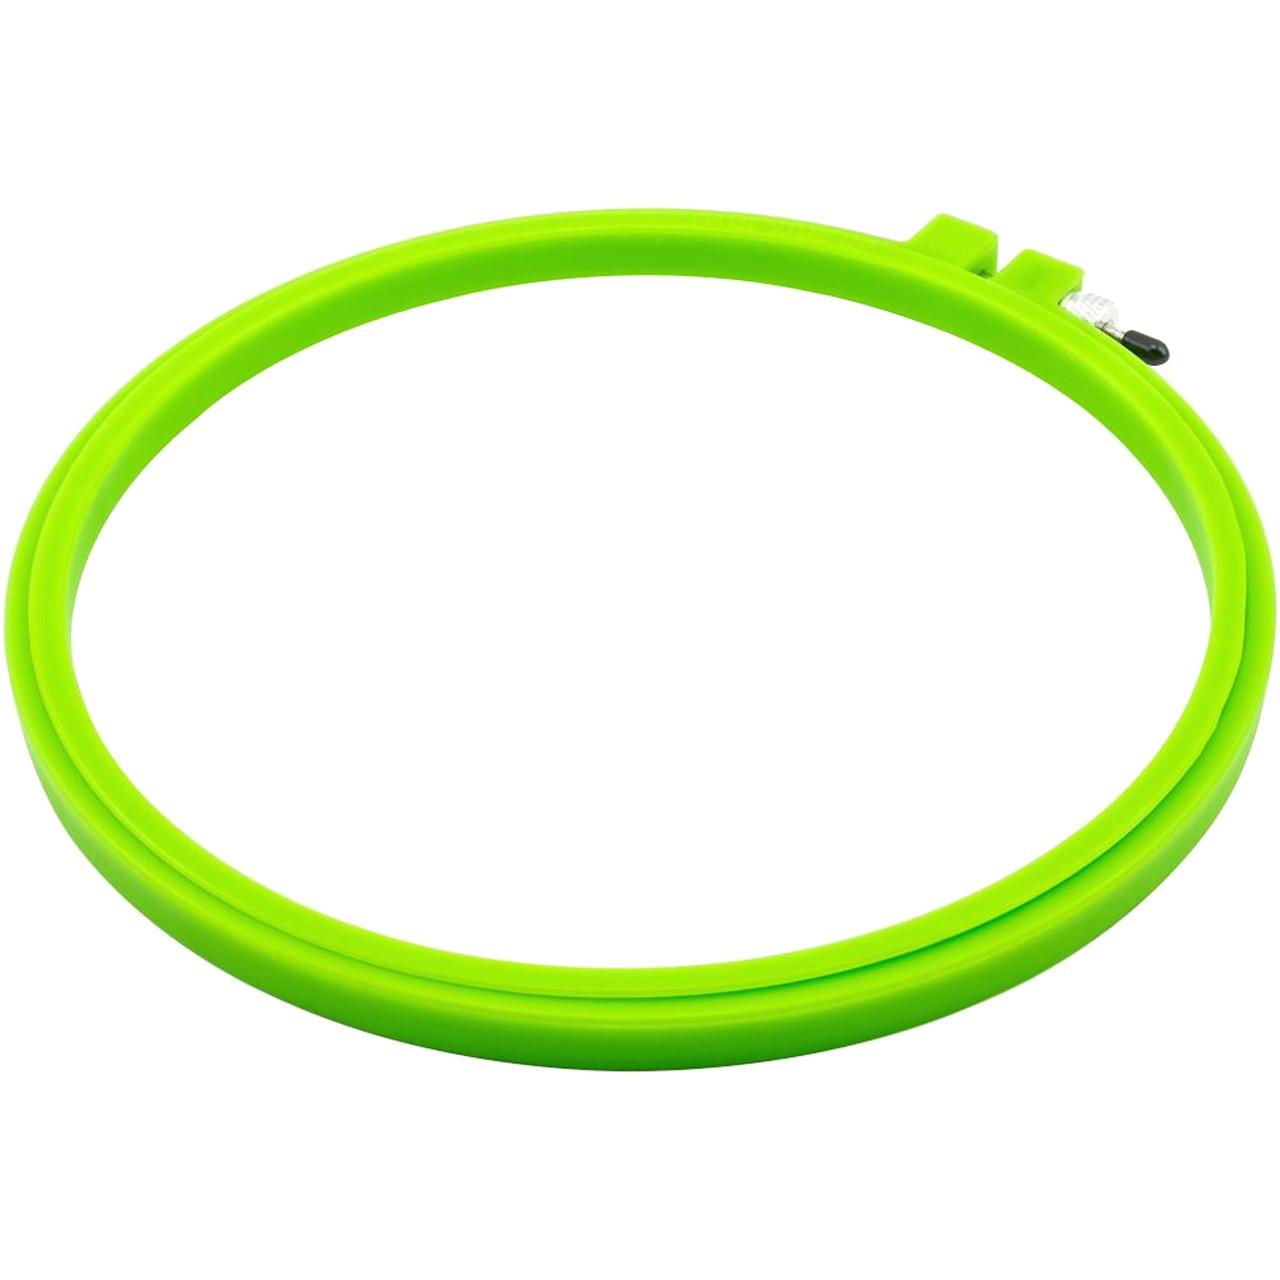 Susan Bates - 5 inch HOOP-La Deluxe Luxite Hoop (Random Color)